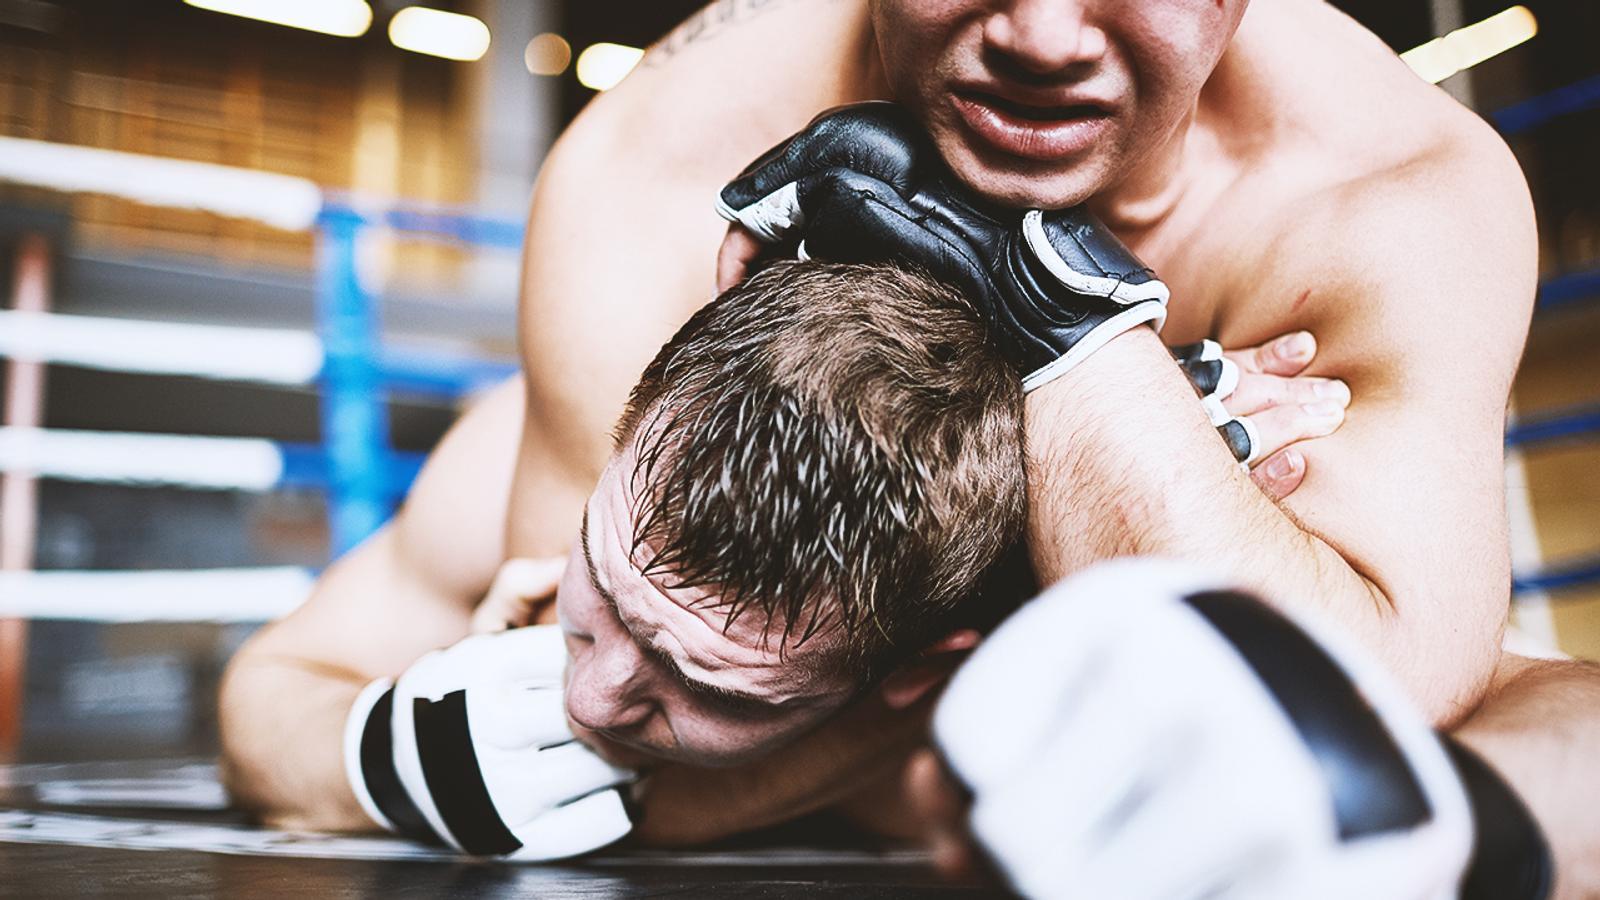 Boxkampf Hooligans / Rechtsextreme